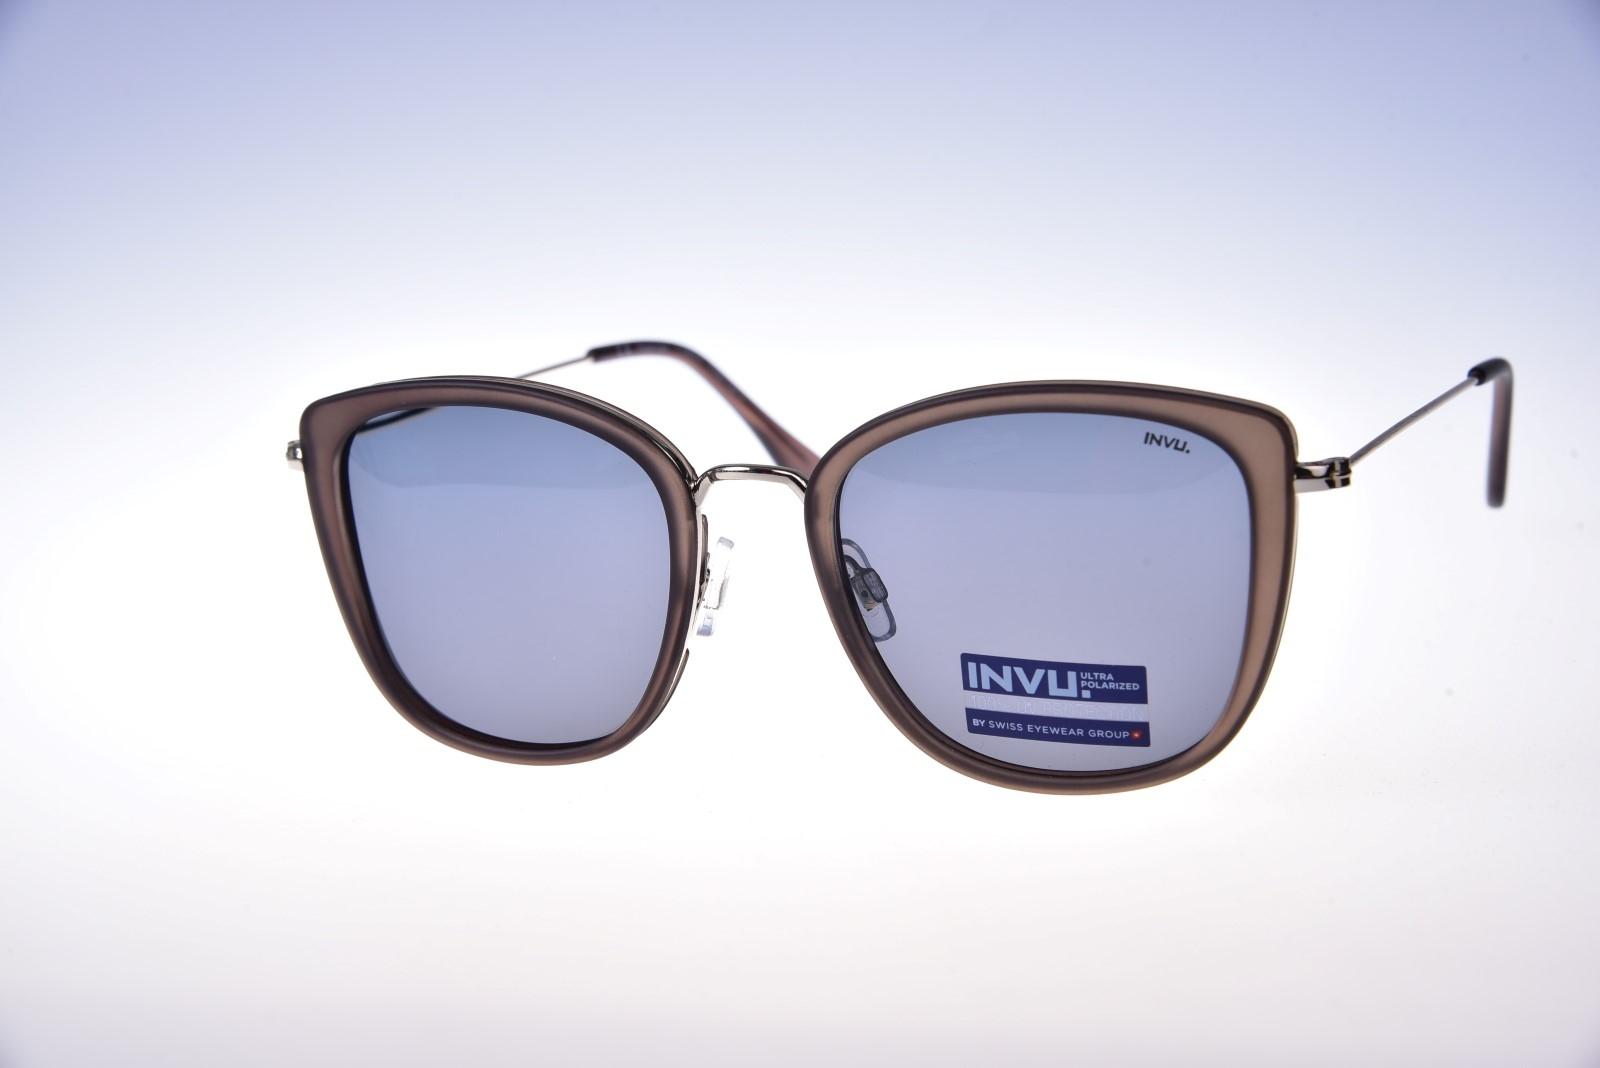 4e4d9e6c3 INVU. Trend T1905A - Dámske, pánske a detské slnečné okuliare ...